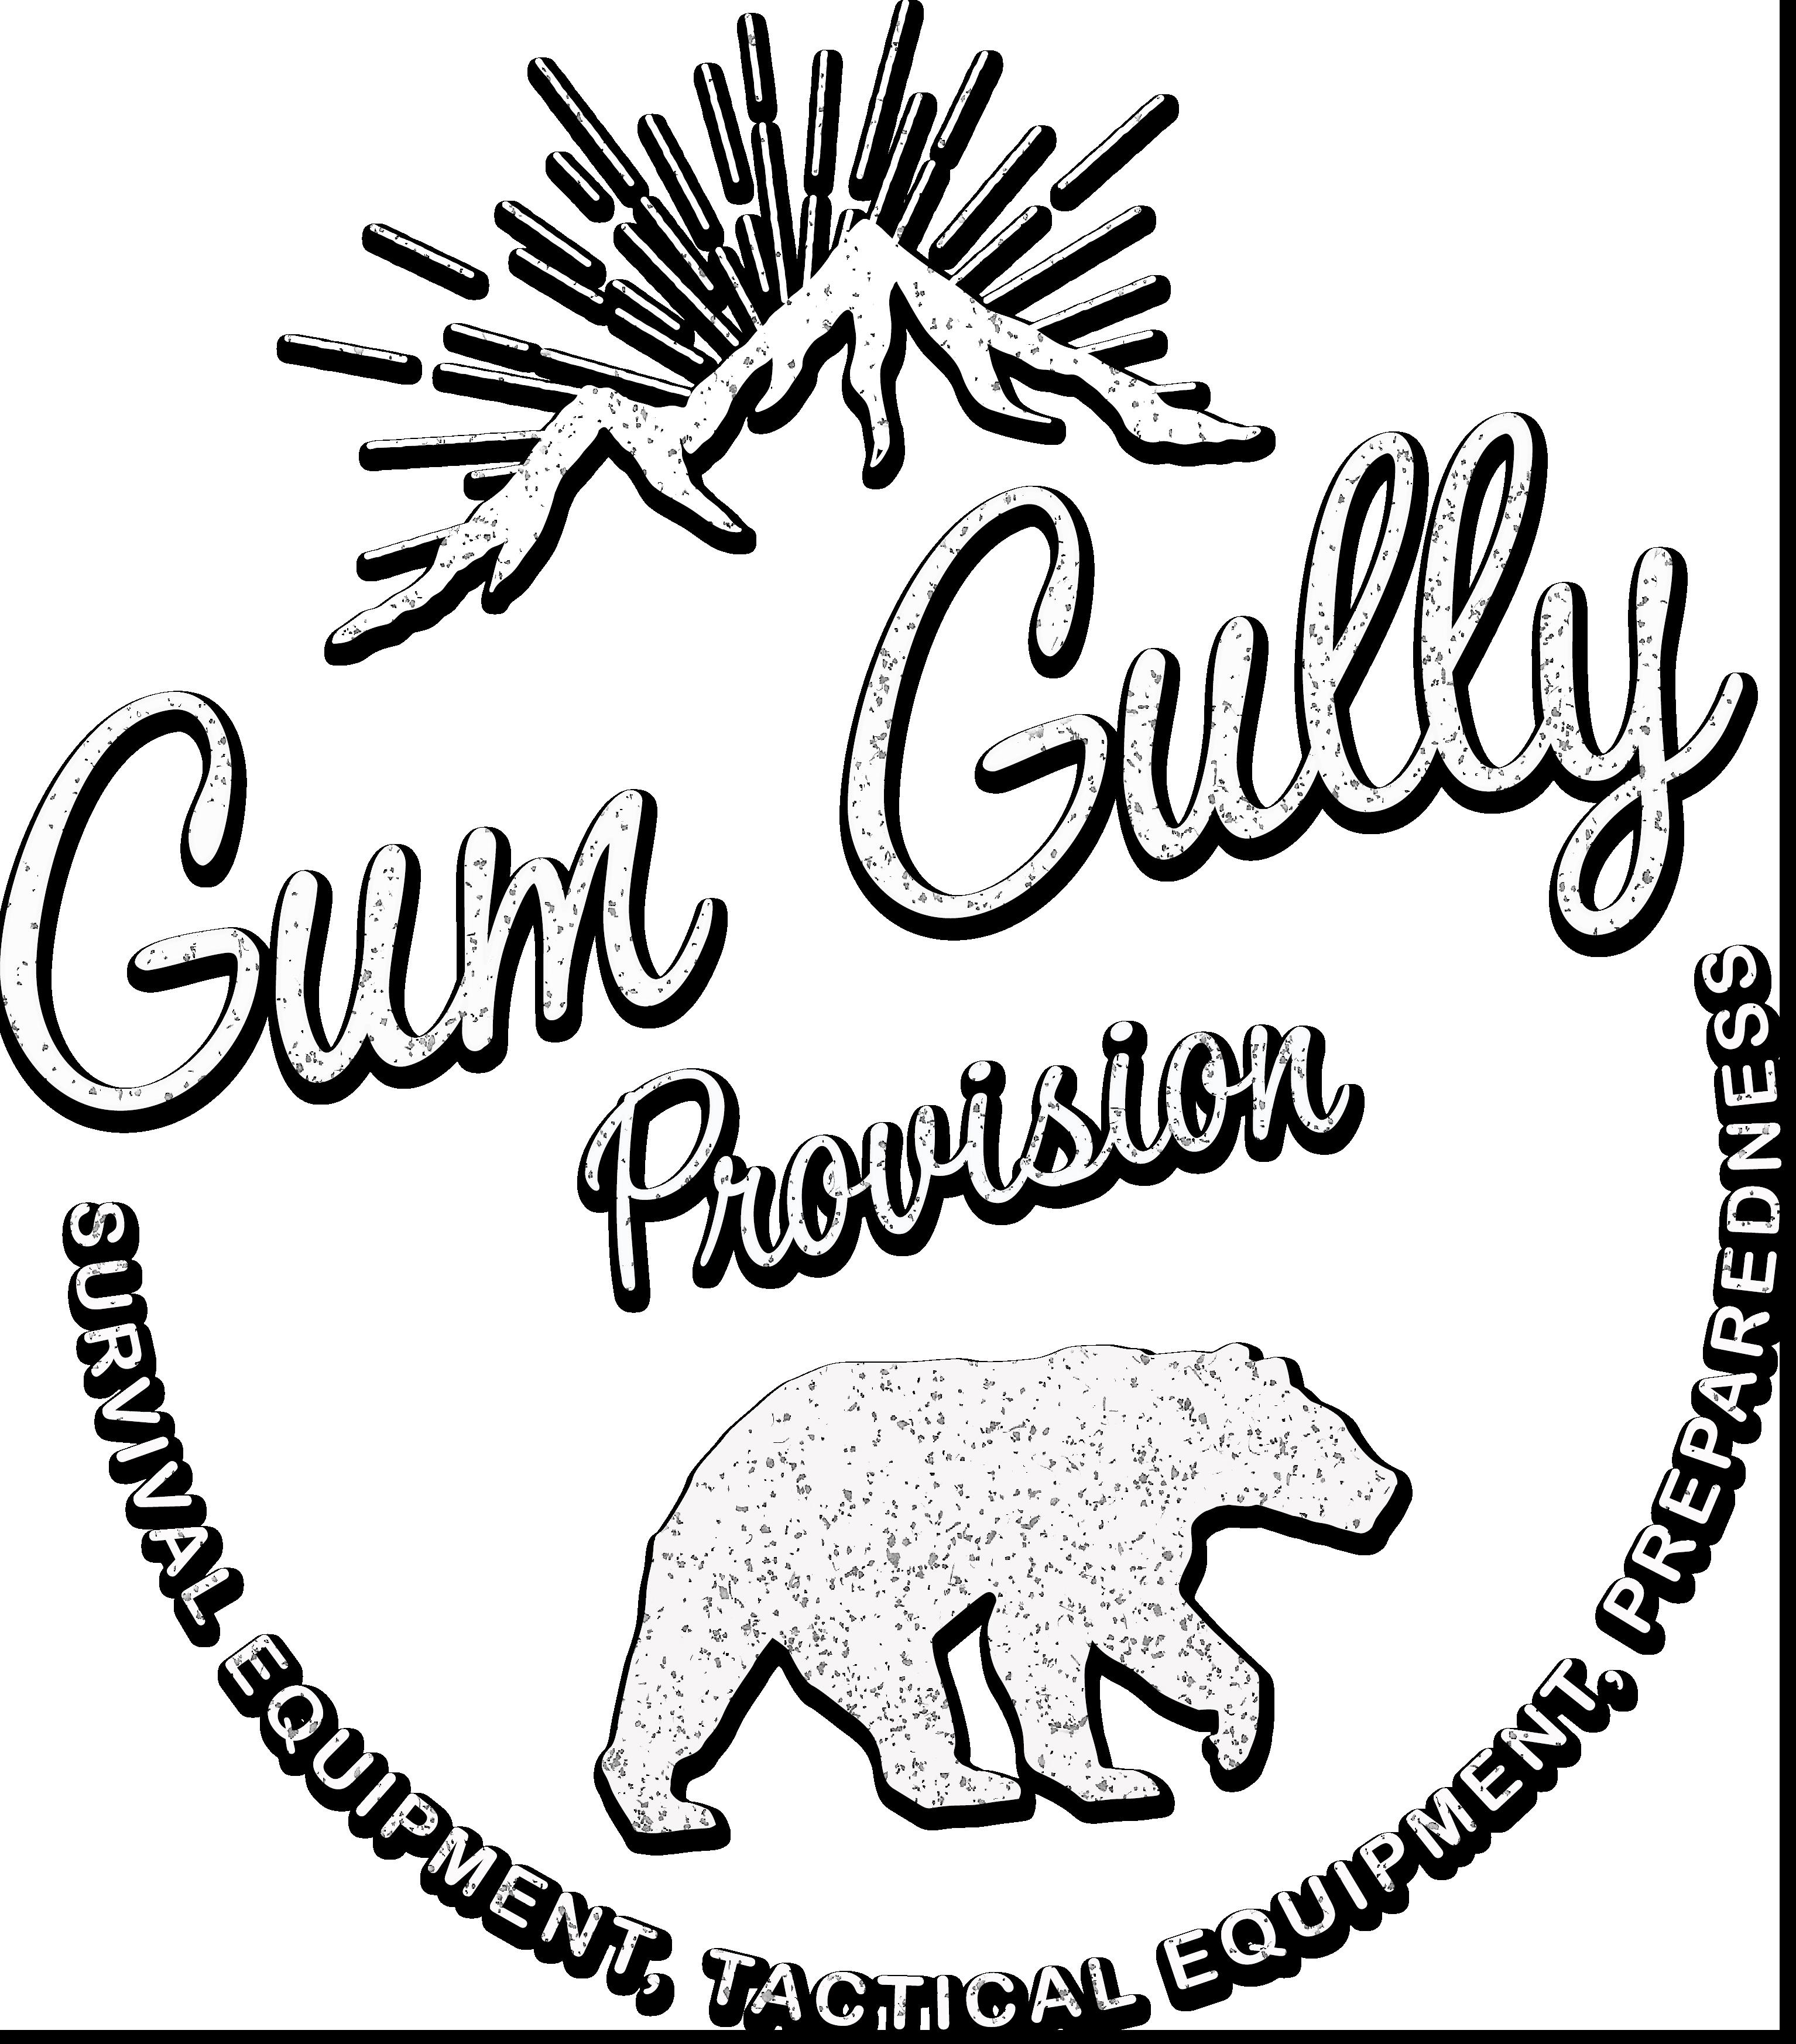 Gum Gully Provision